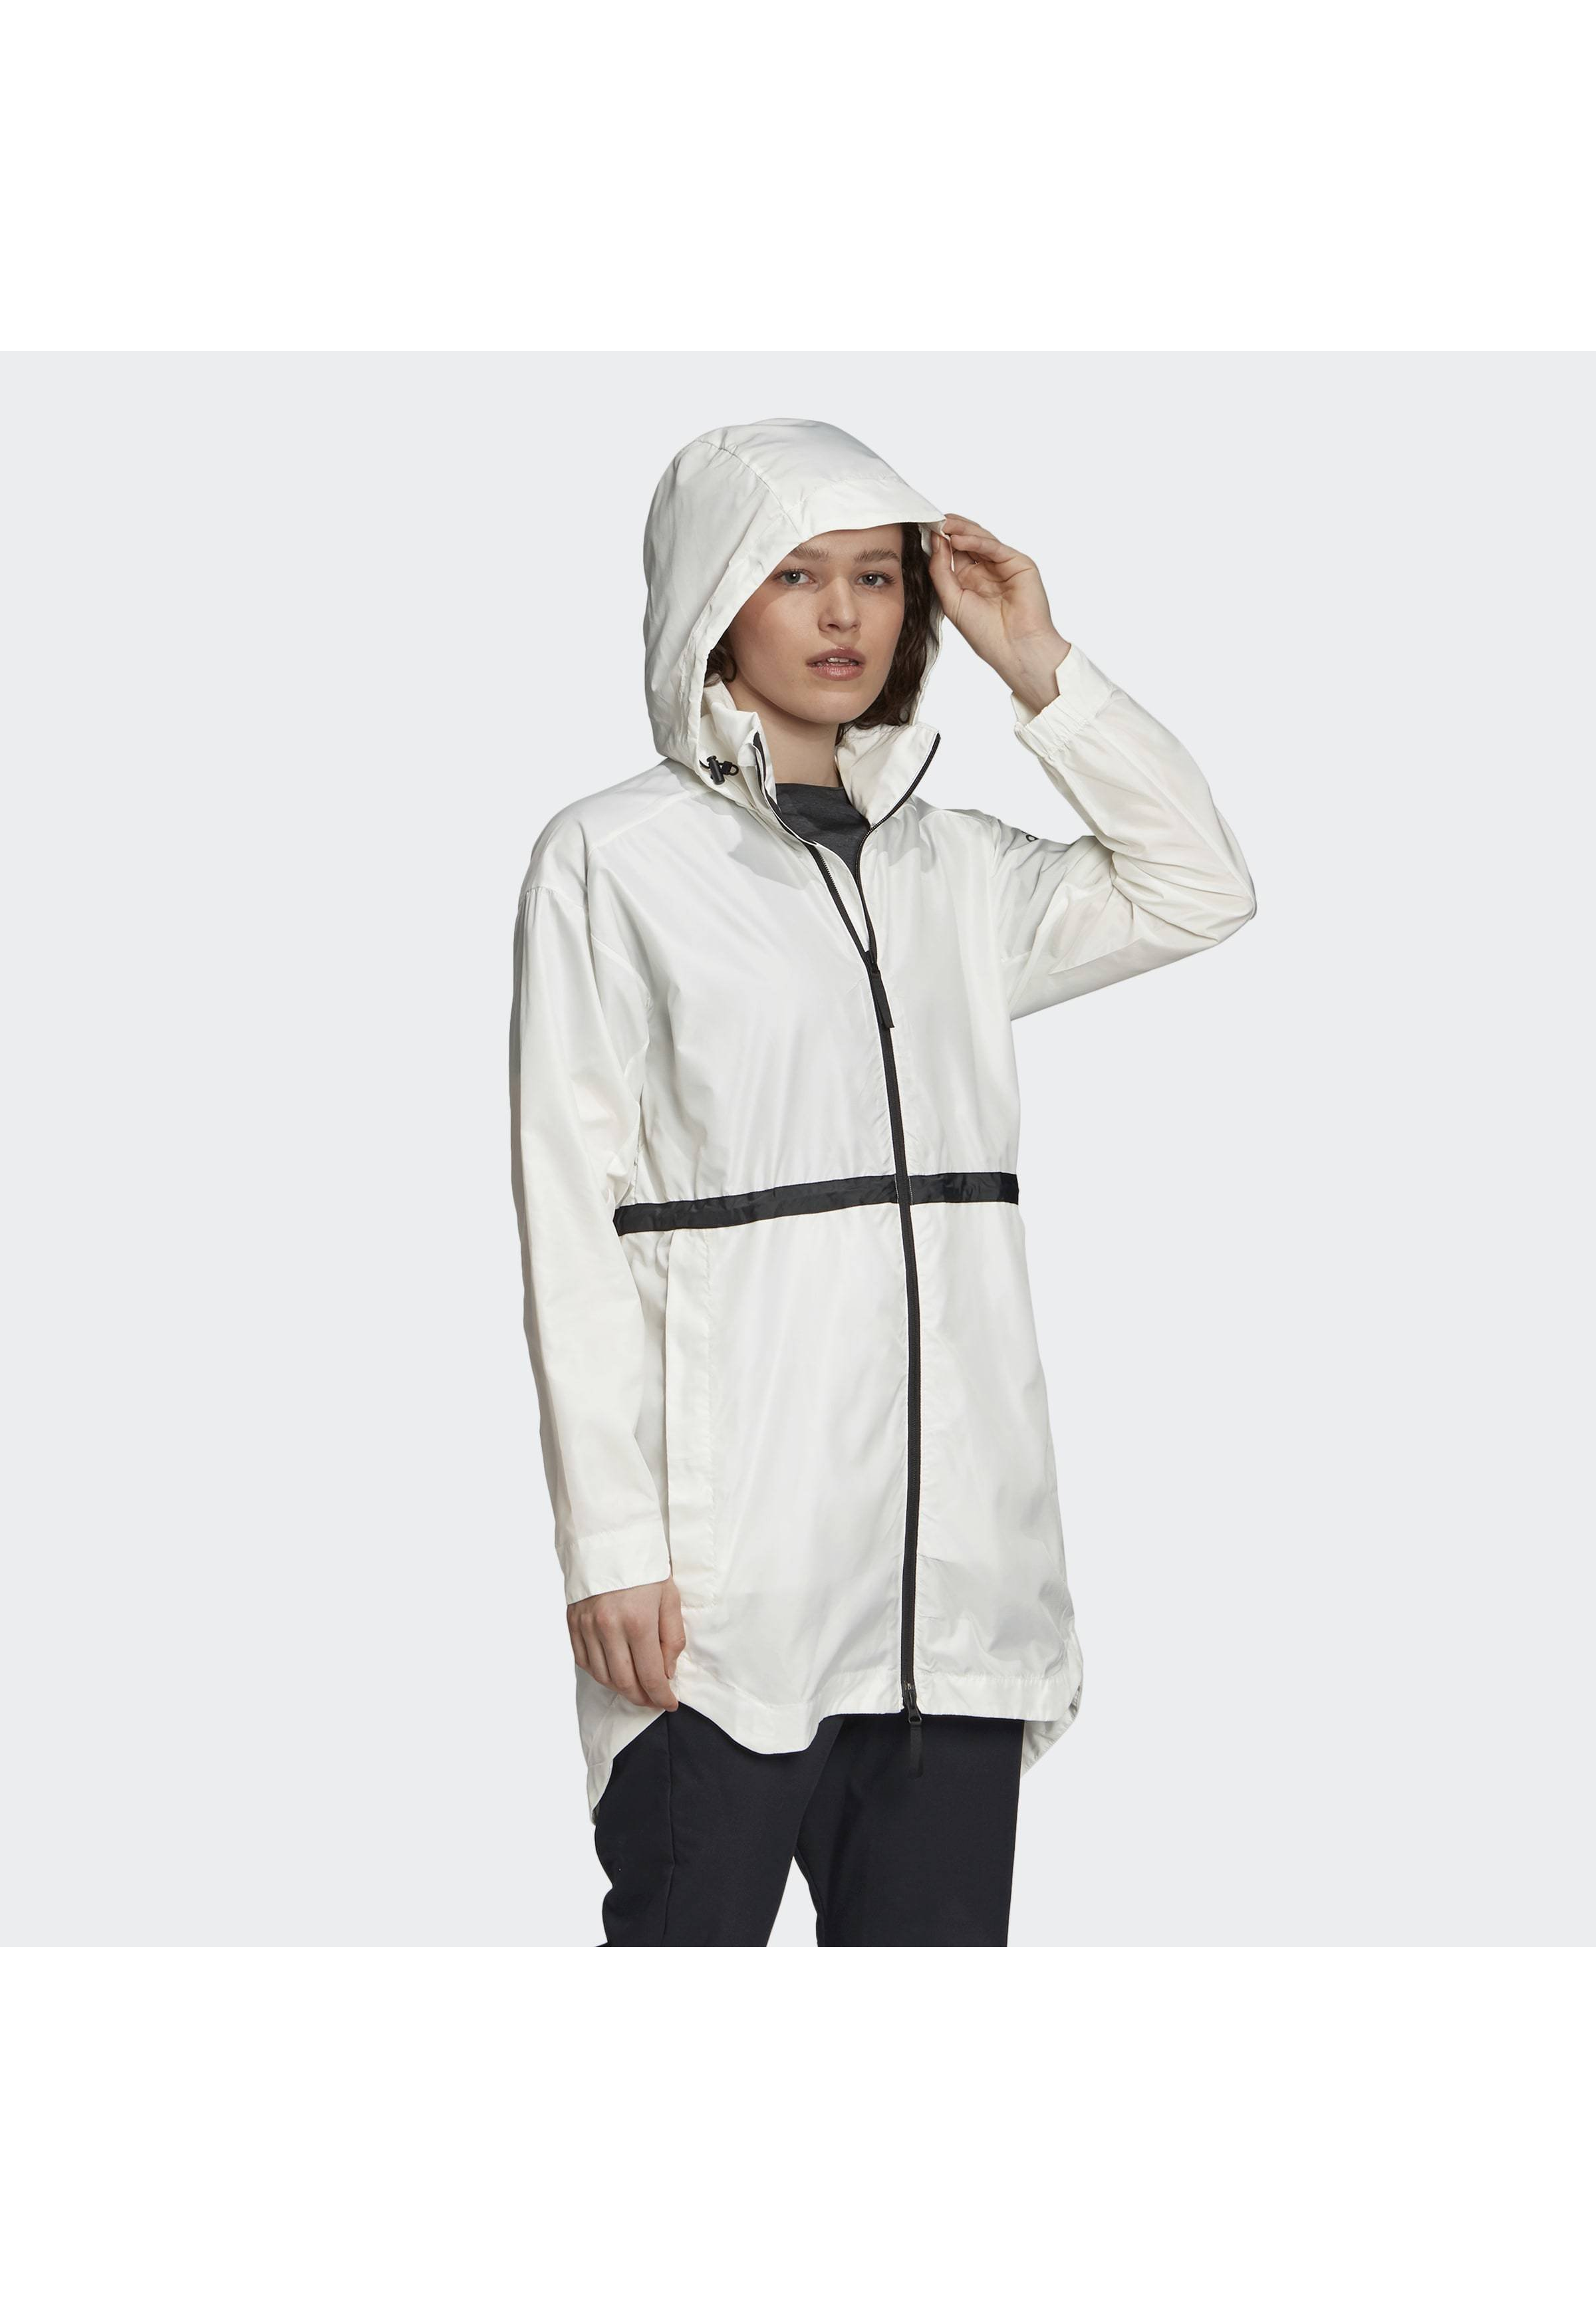 Super Specials Women's Clothing adidas Performance URBAN WIND.RDY PARKA Windbreaker white b9cVxlw6m